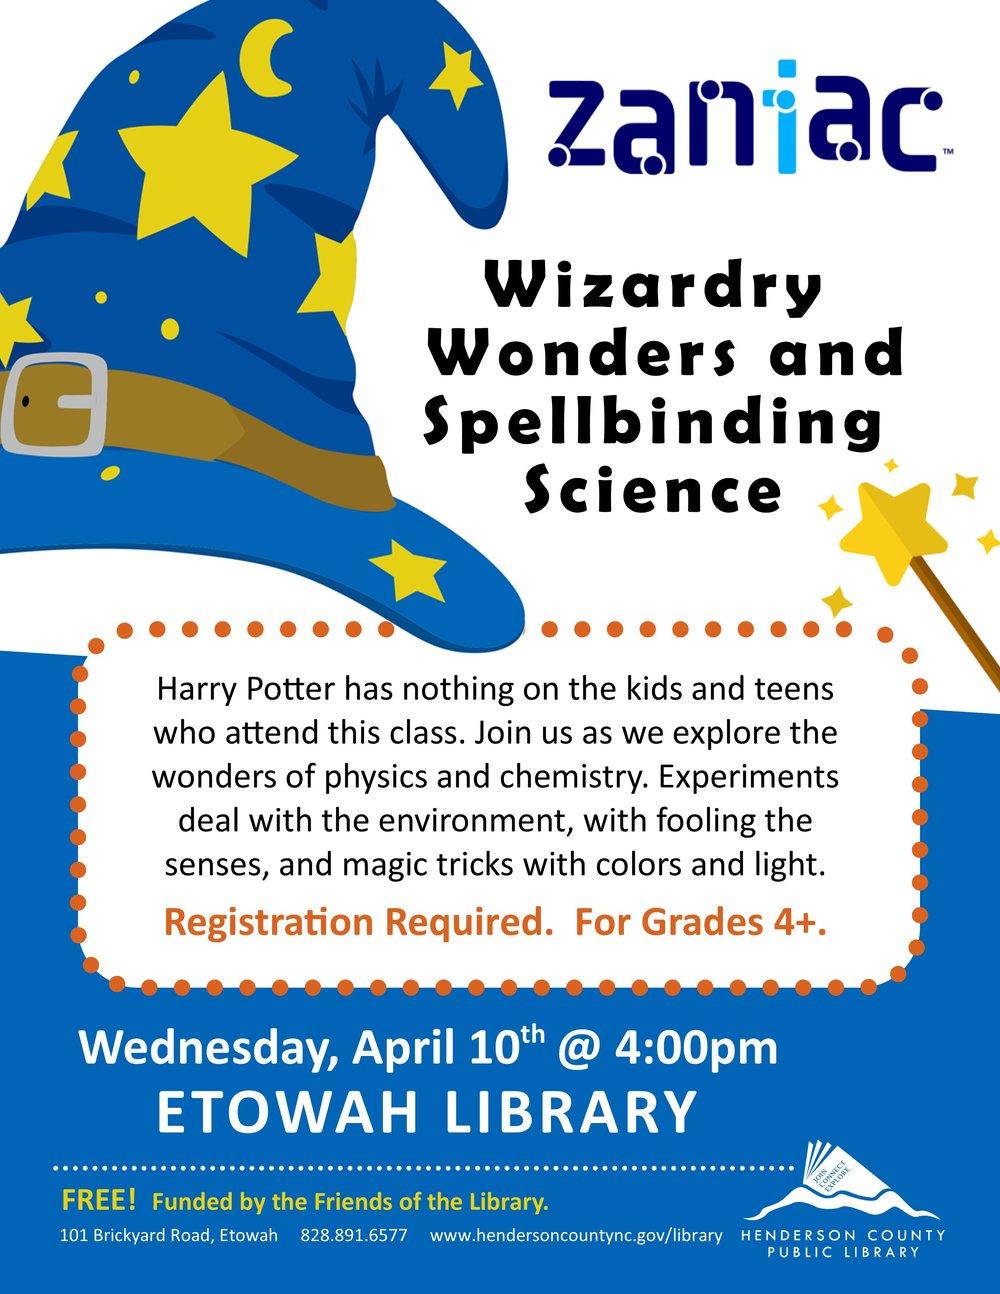 ET- Zaniac Wizardry Wonders and Spellbinding Science.jpg